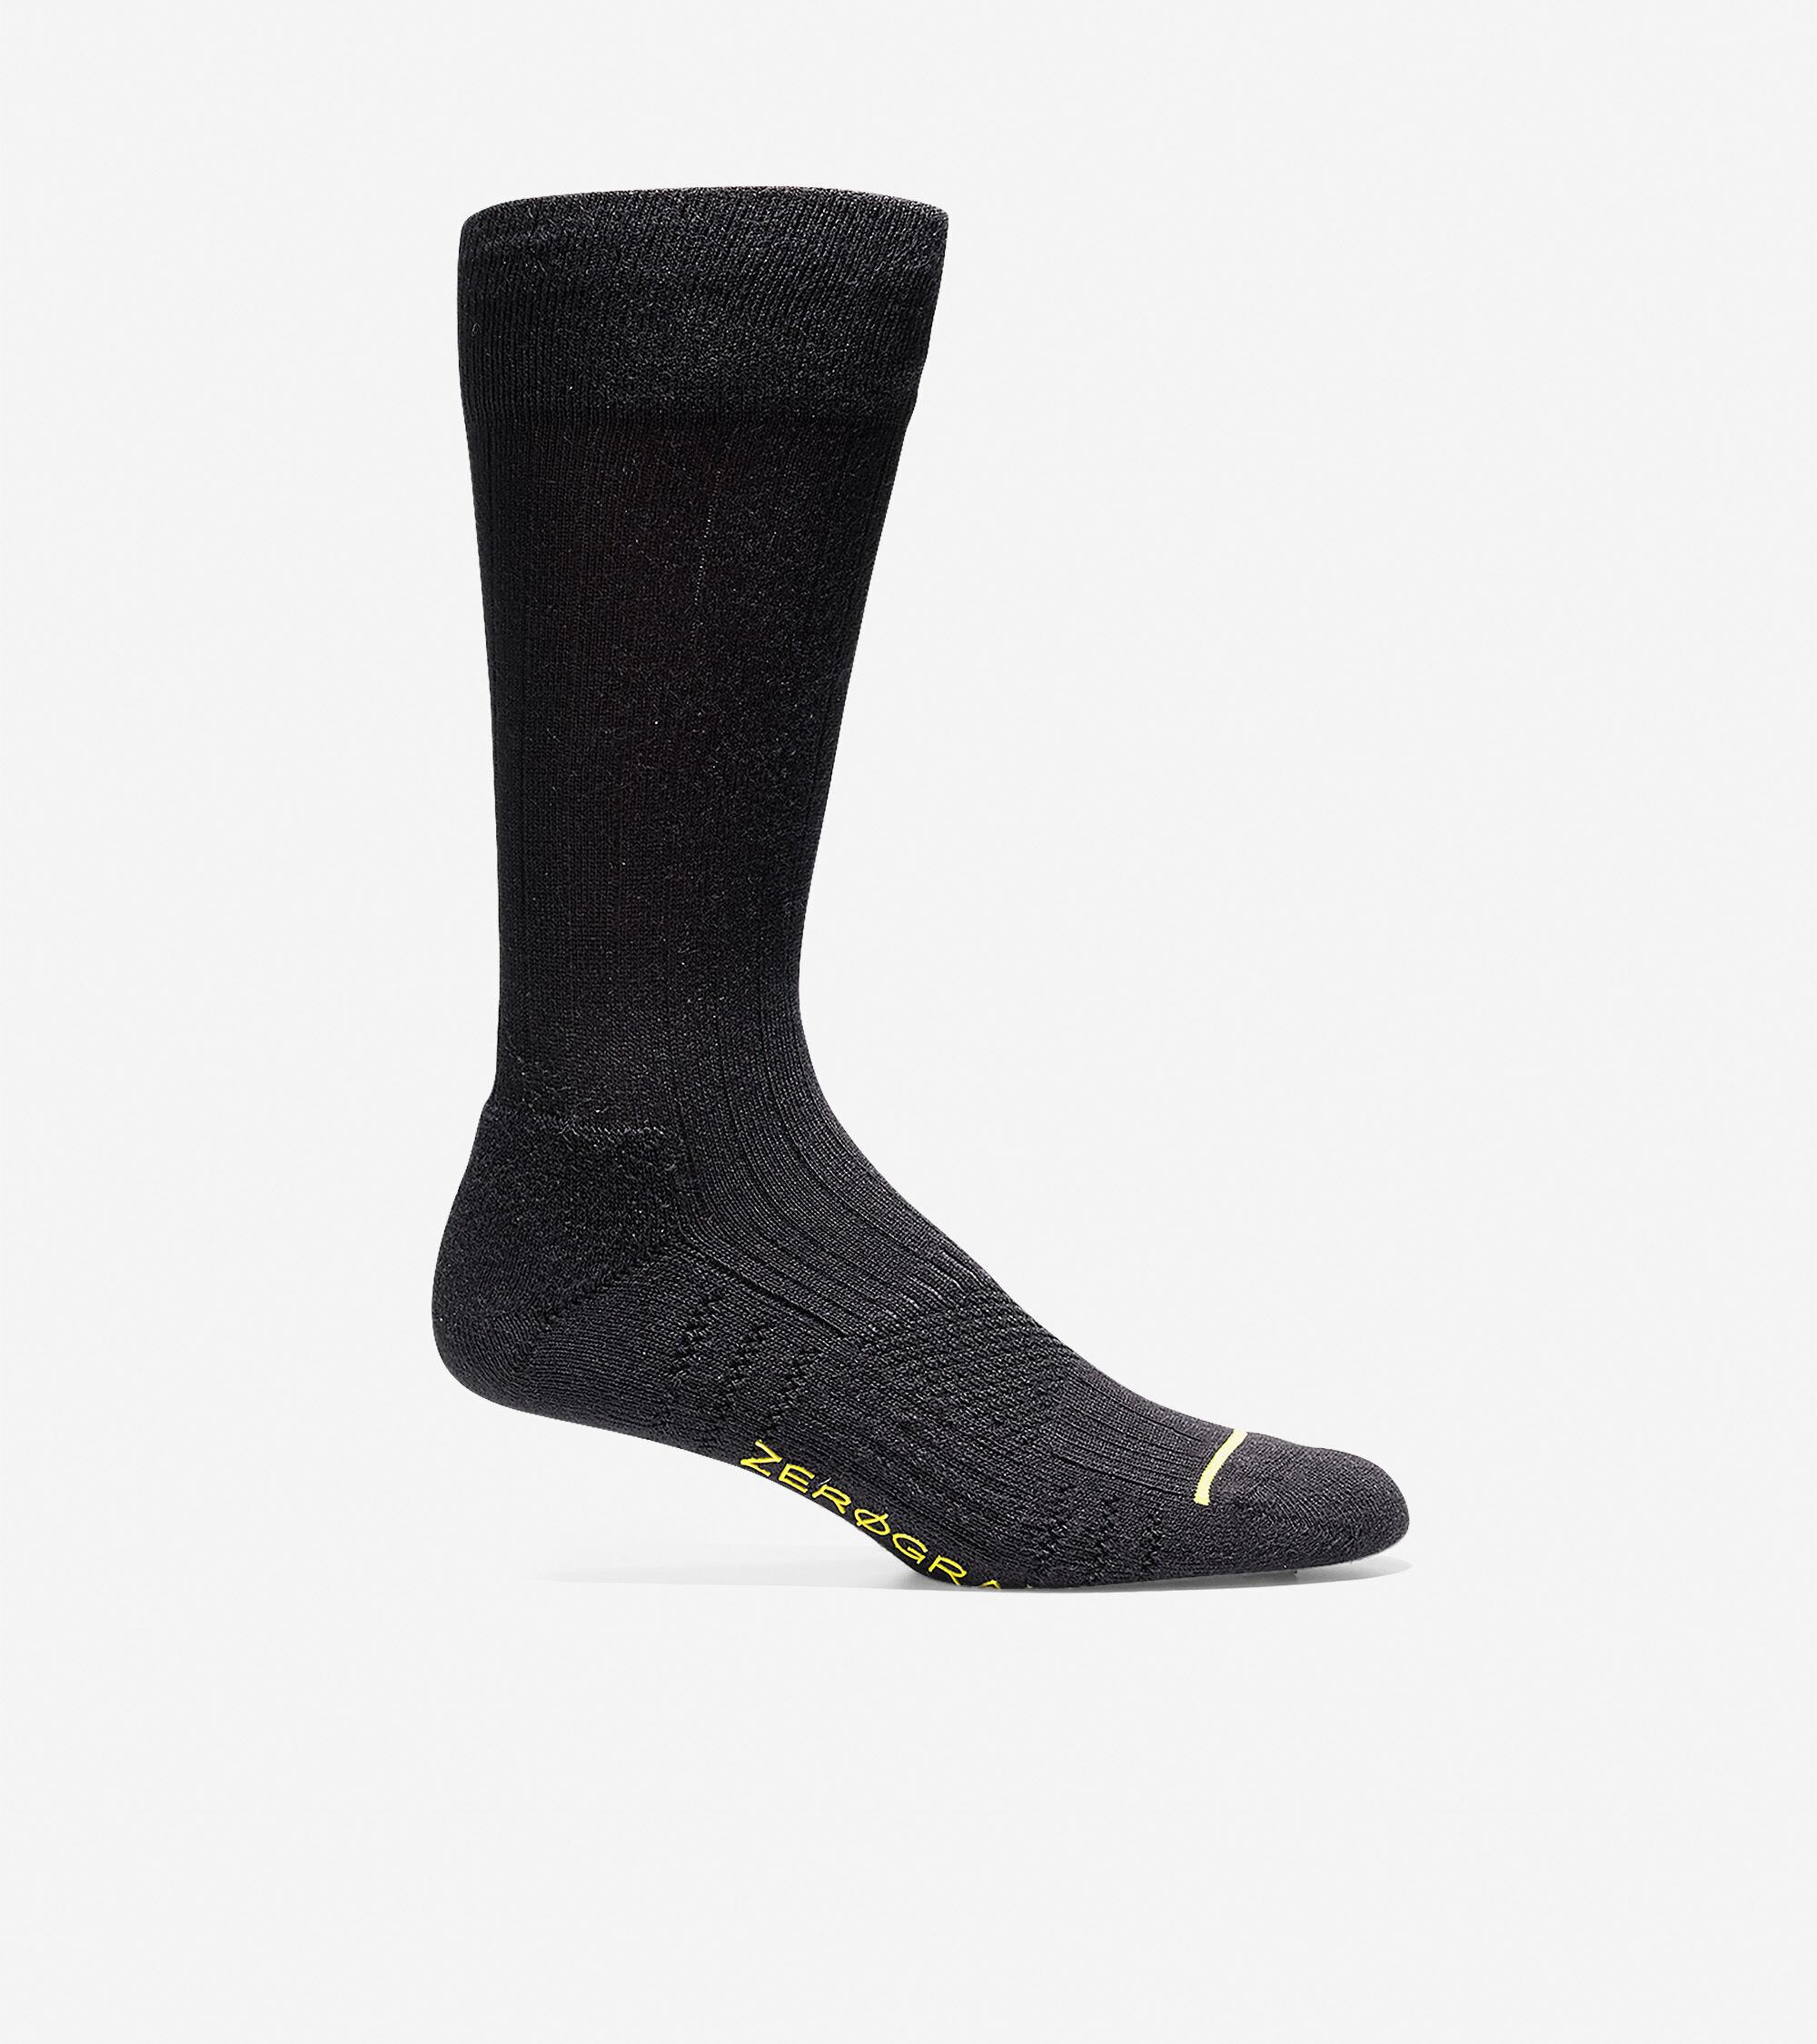 Cole Haan ZERØGRAND Rib Crew Socks - Black - Size: OSFA